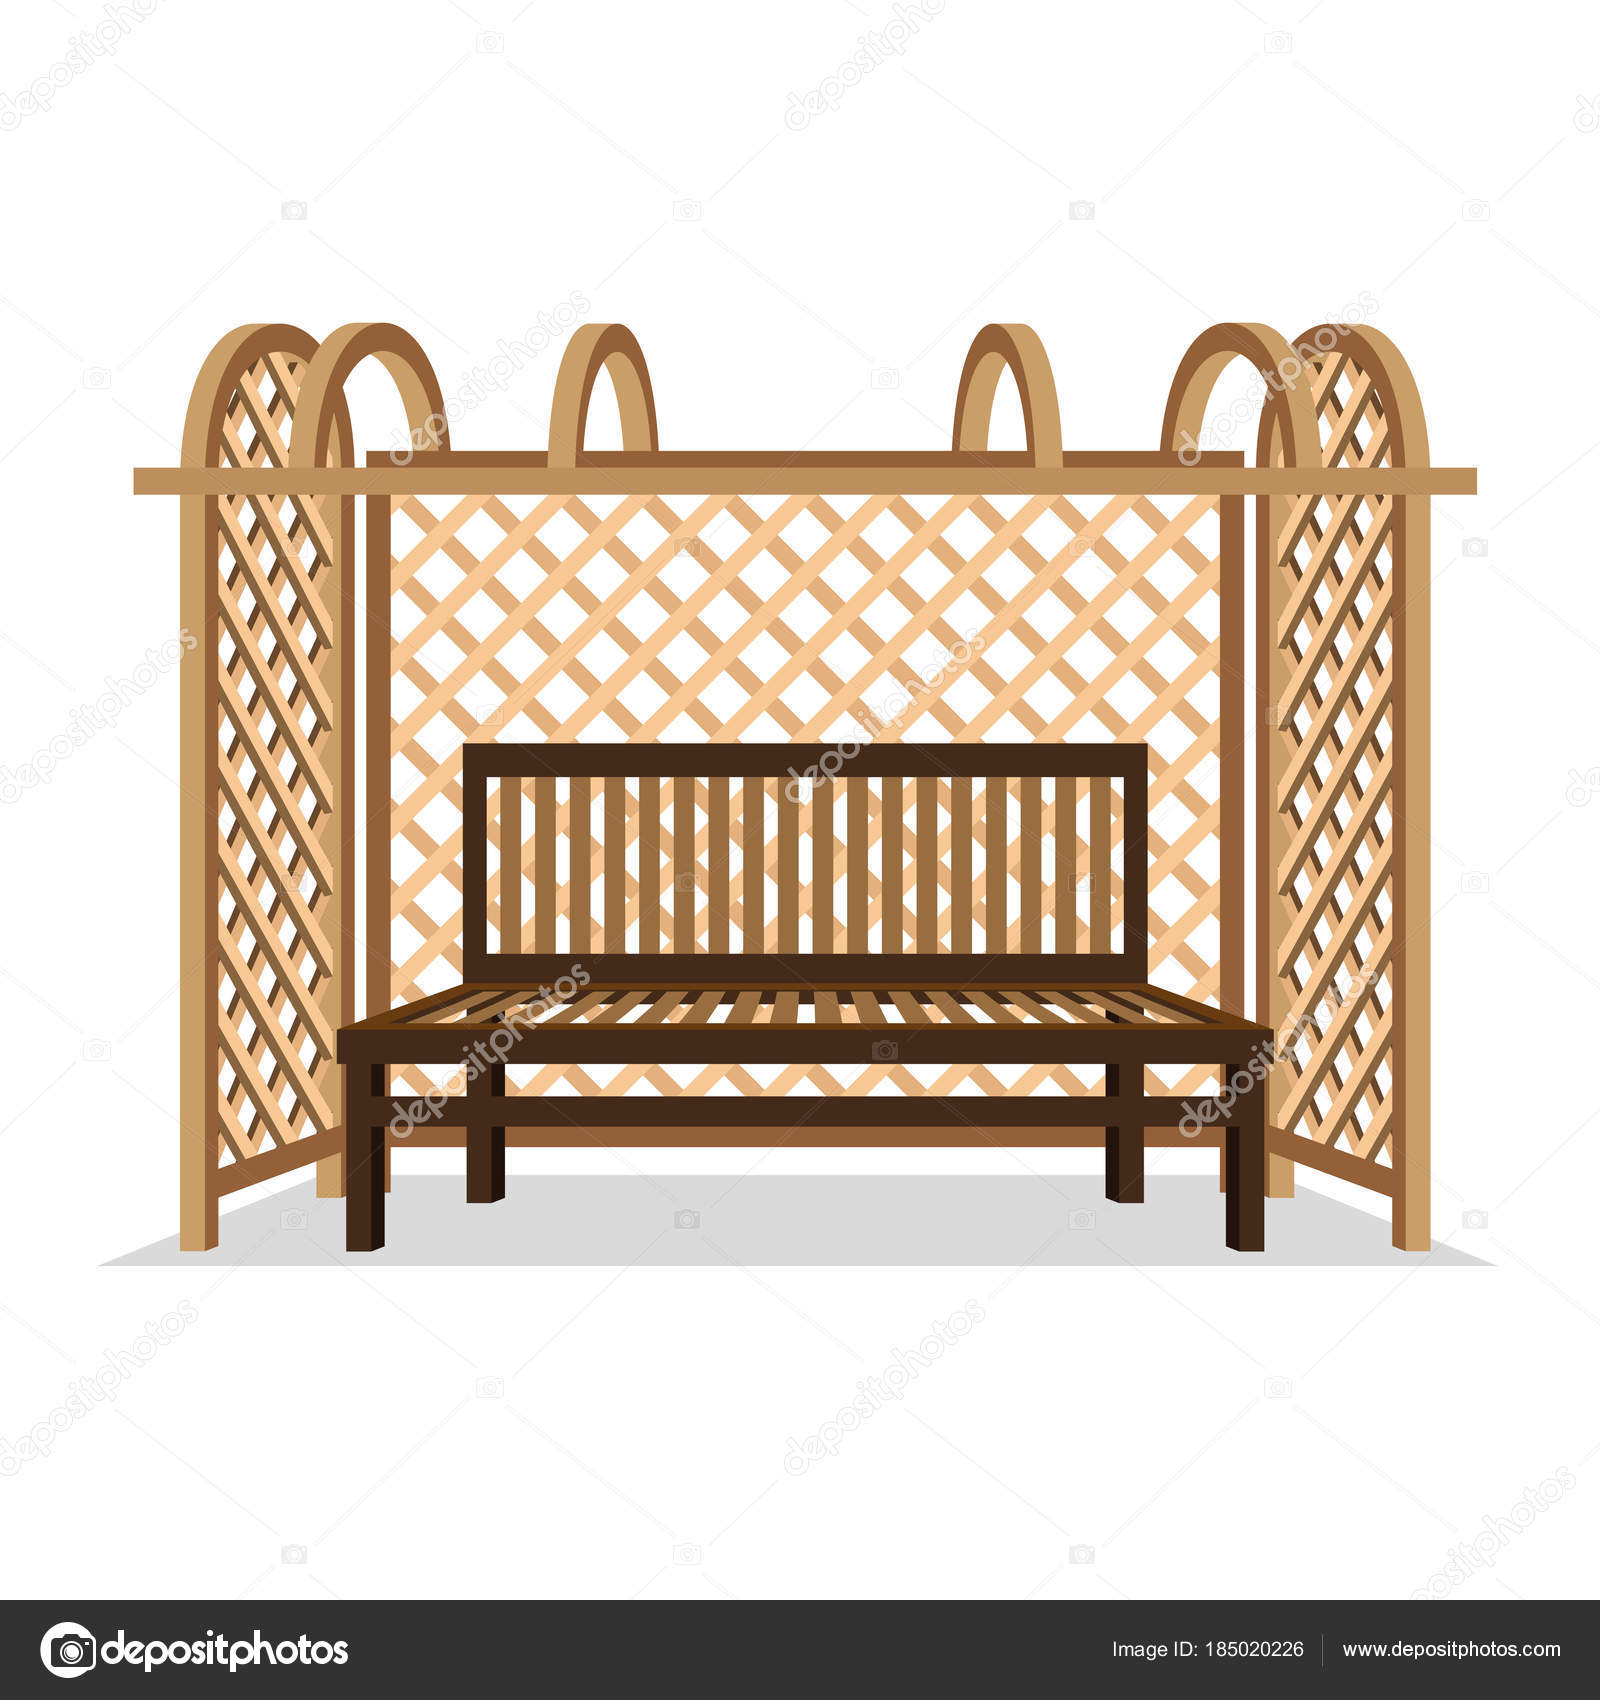 Brilliant Wooden Bench Pergola White Background Stock Vector Forskolin Free Trial Chair Design Images Forskolin Free Trialorg